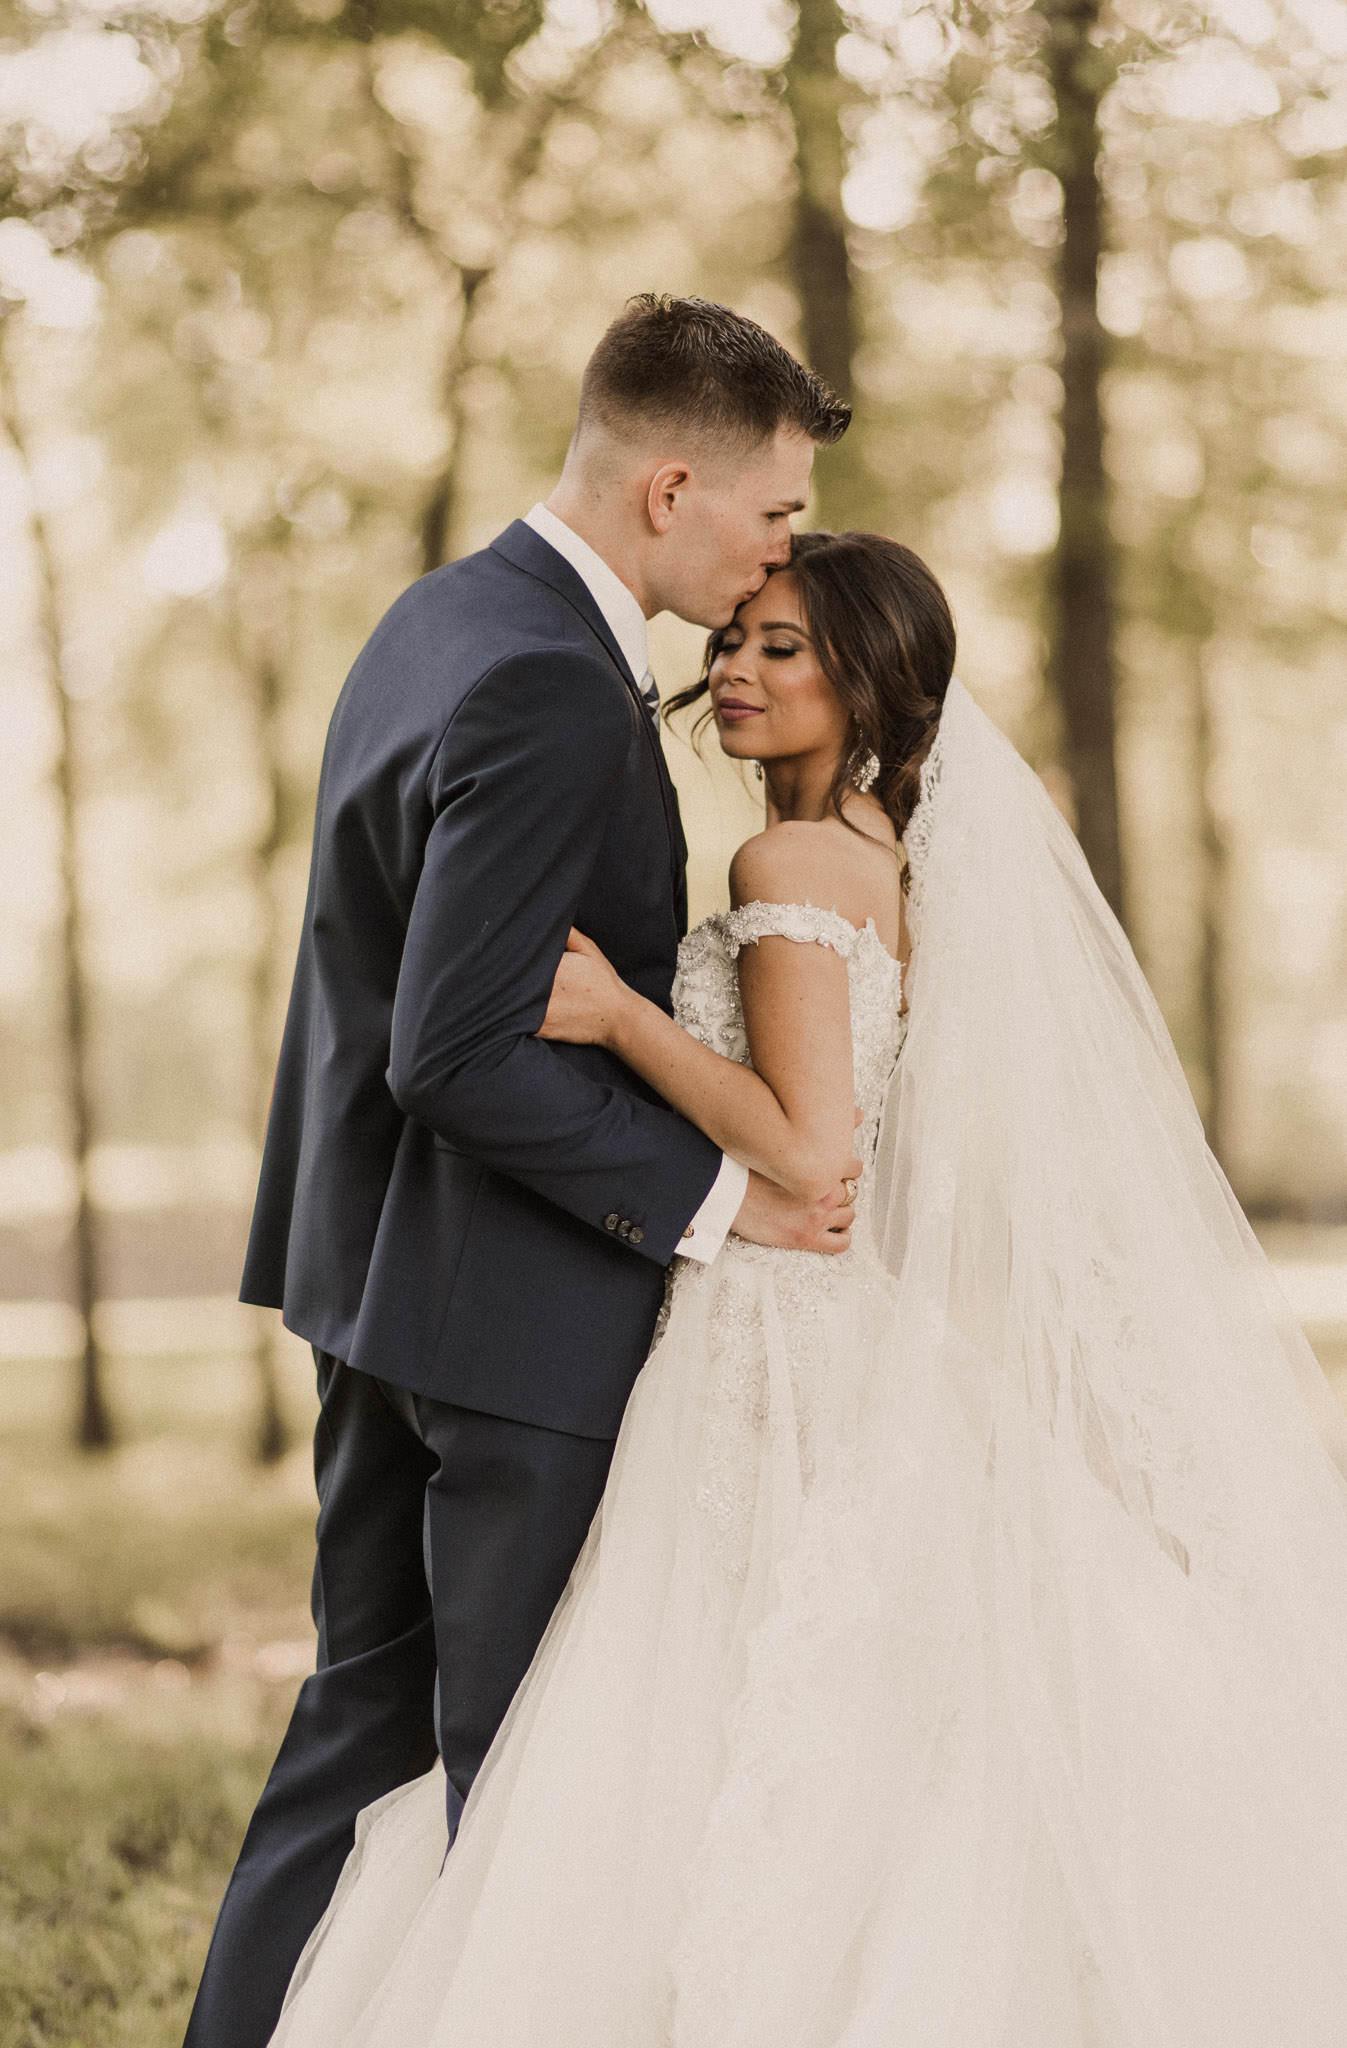 adriana-christian-wedding-re-sm-107.jpg